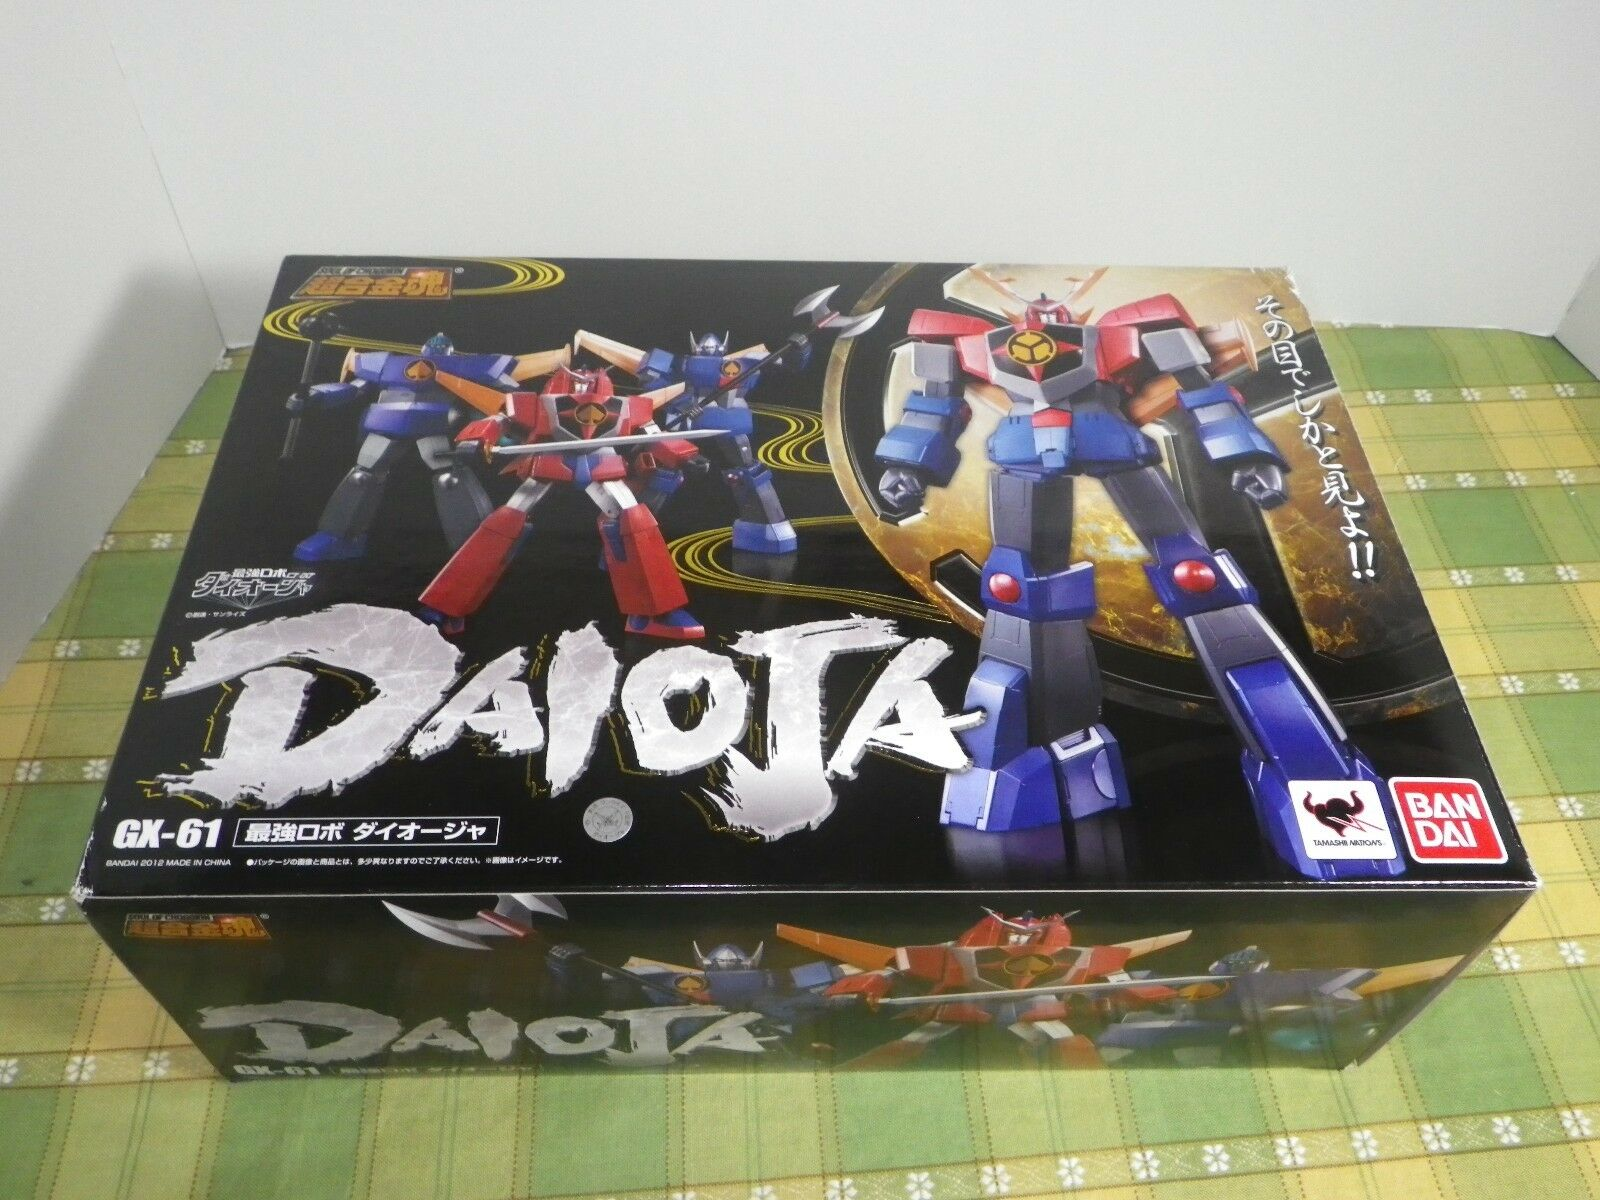 Bandai GX-61 daiohja  Ultimate robot daiohja  - Soul Of Chogokin